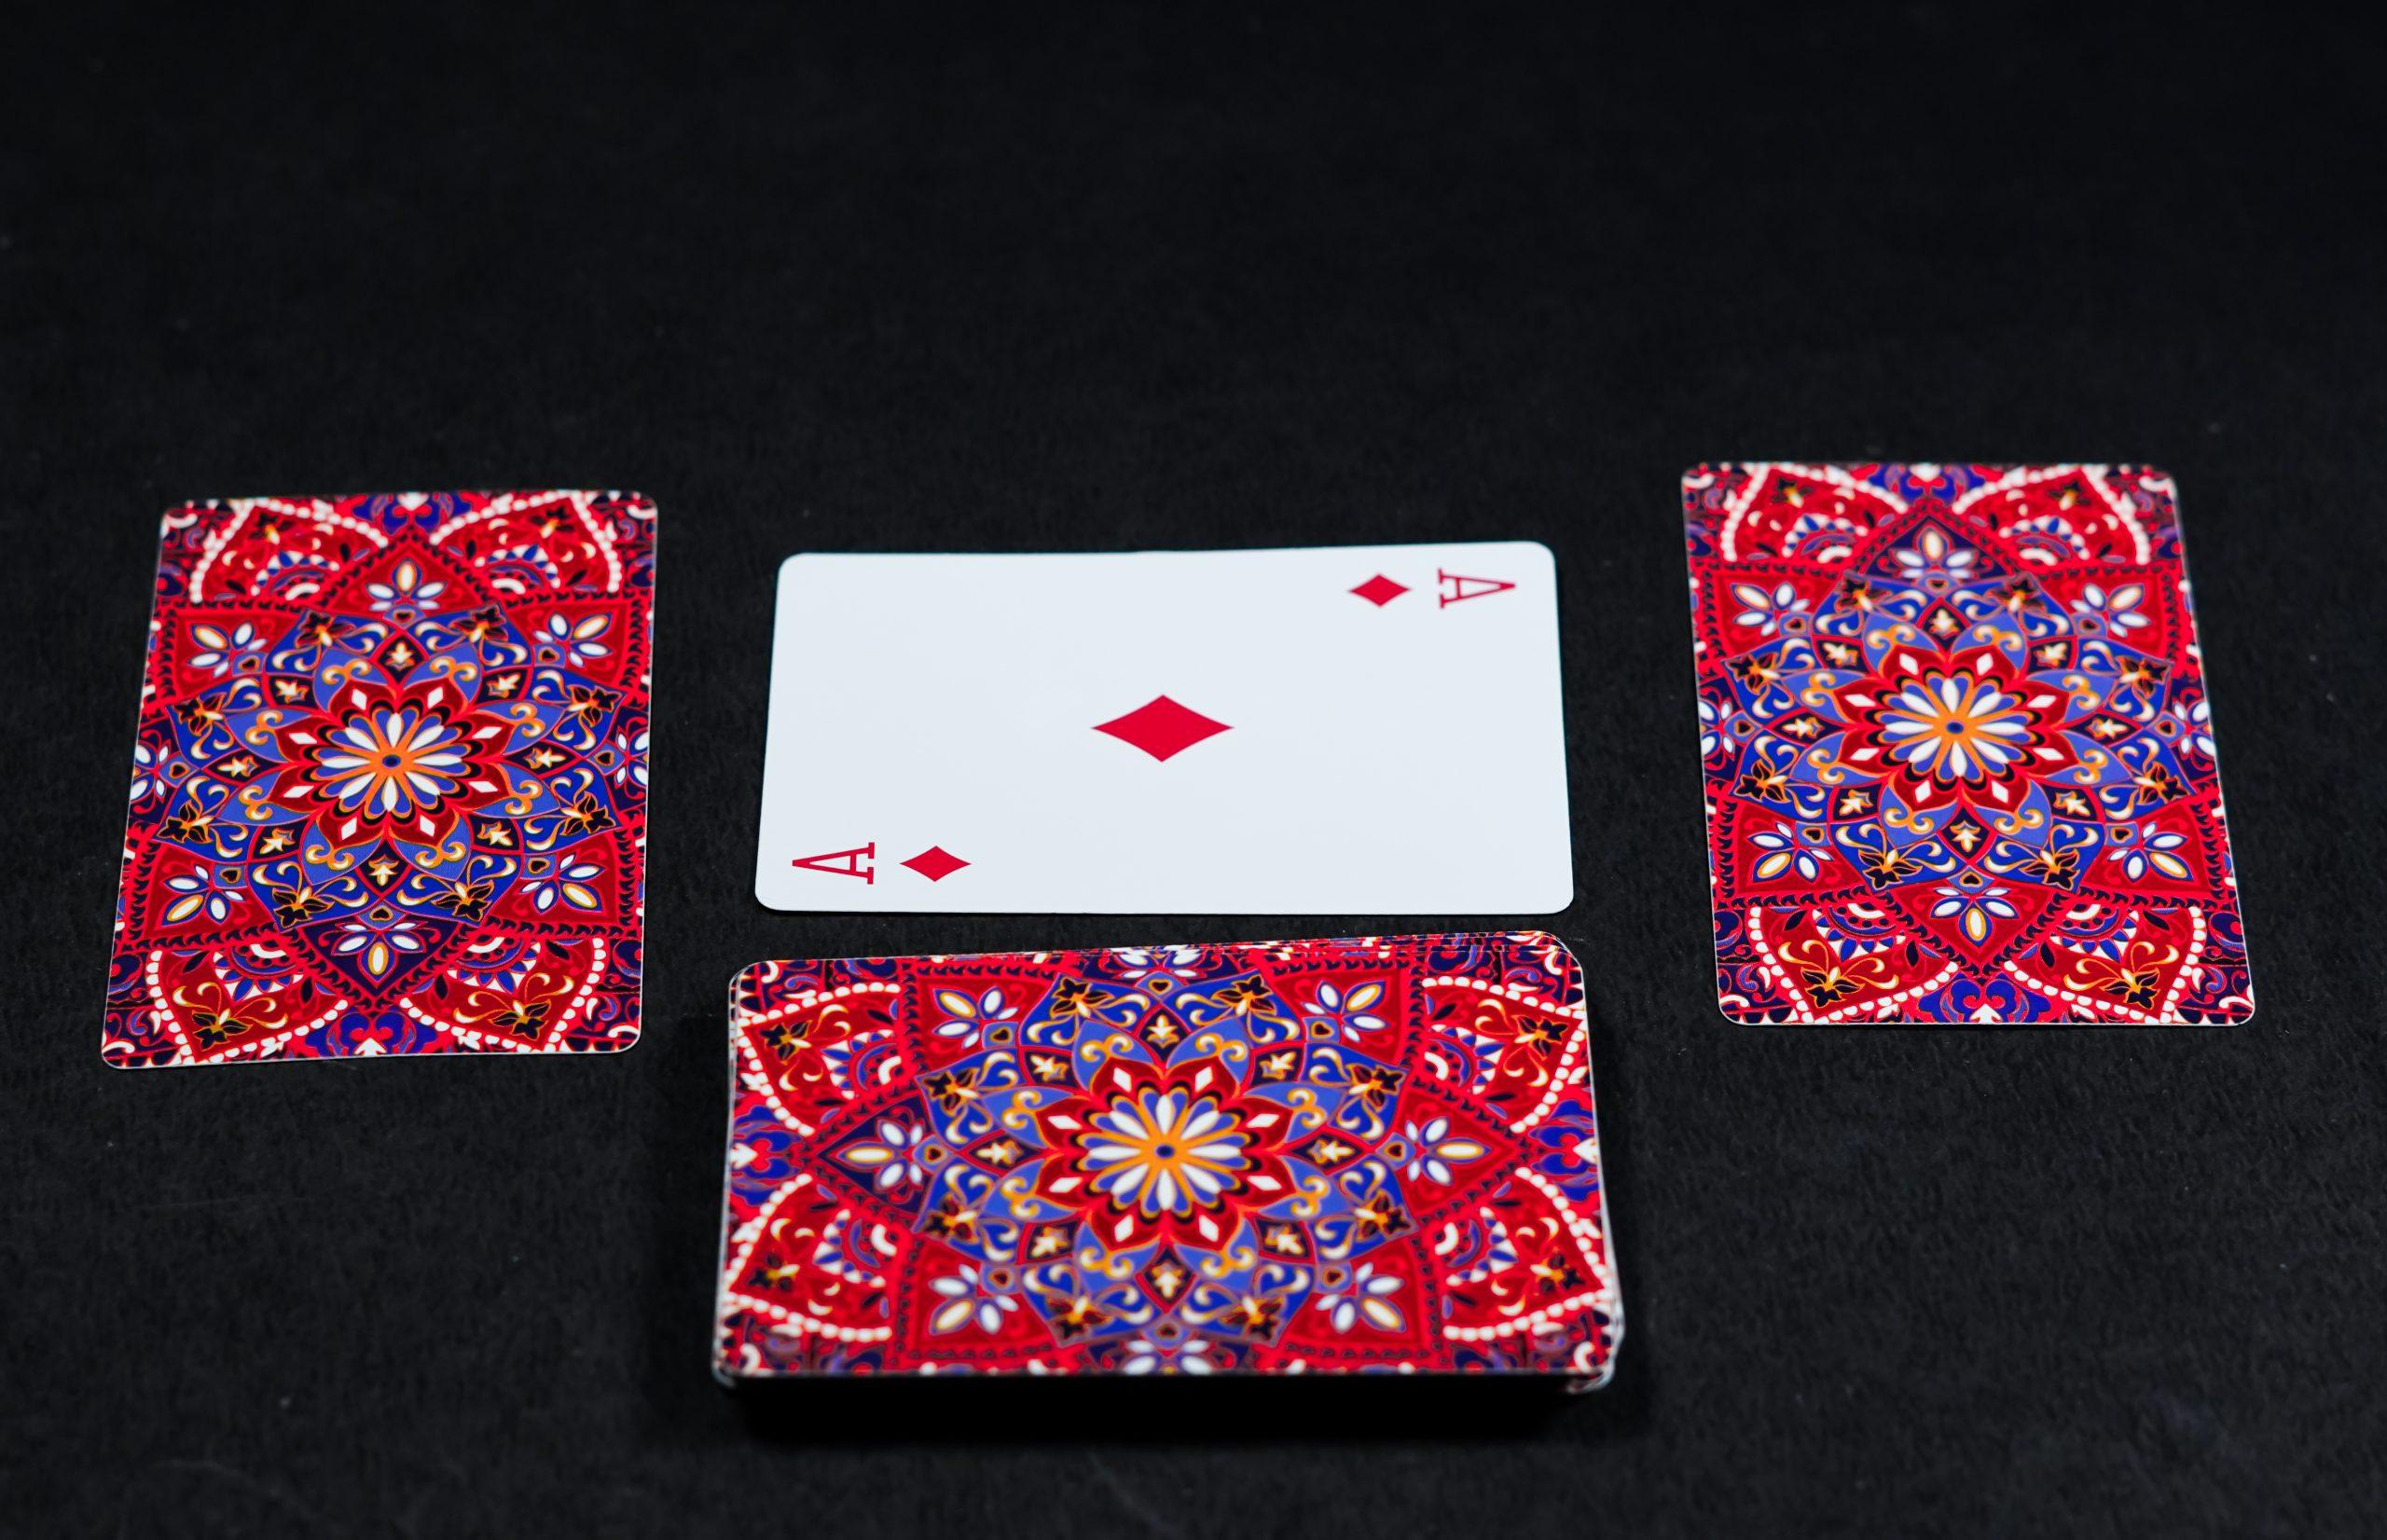 Ace Card of Diamond